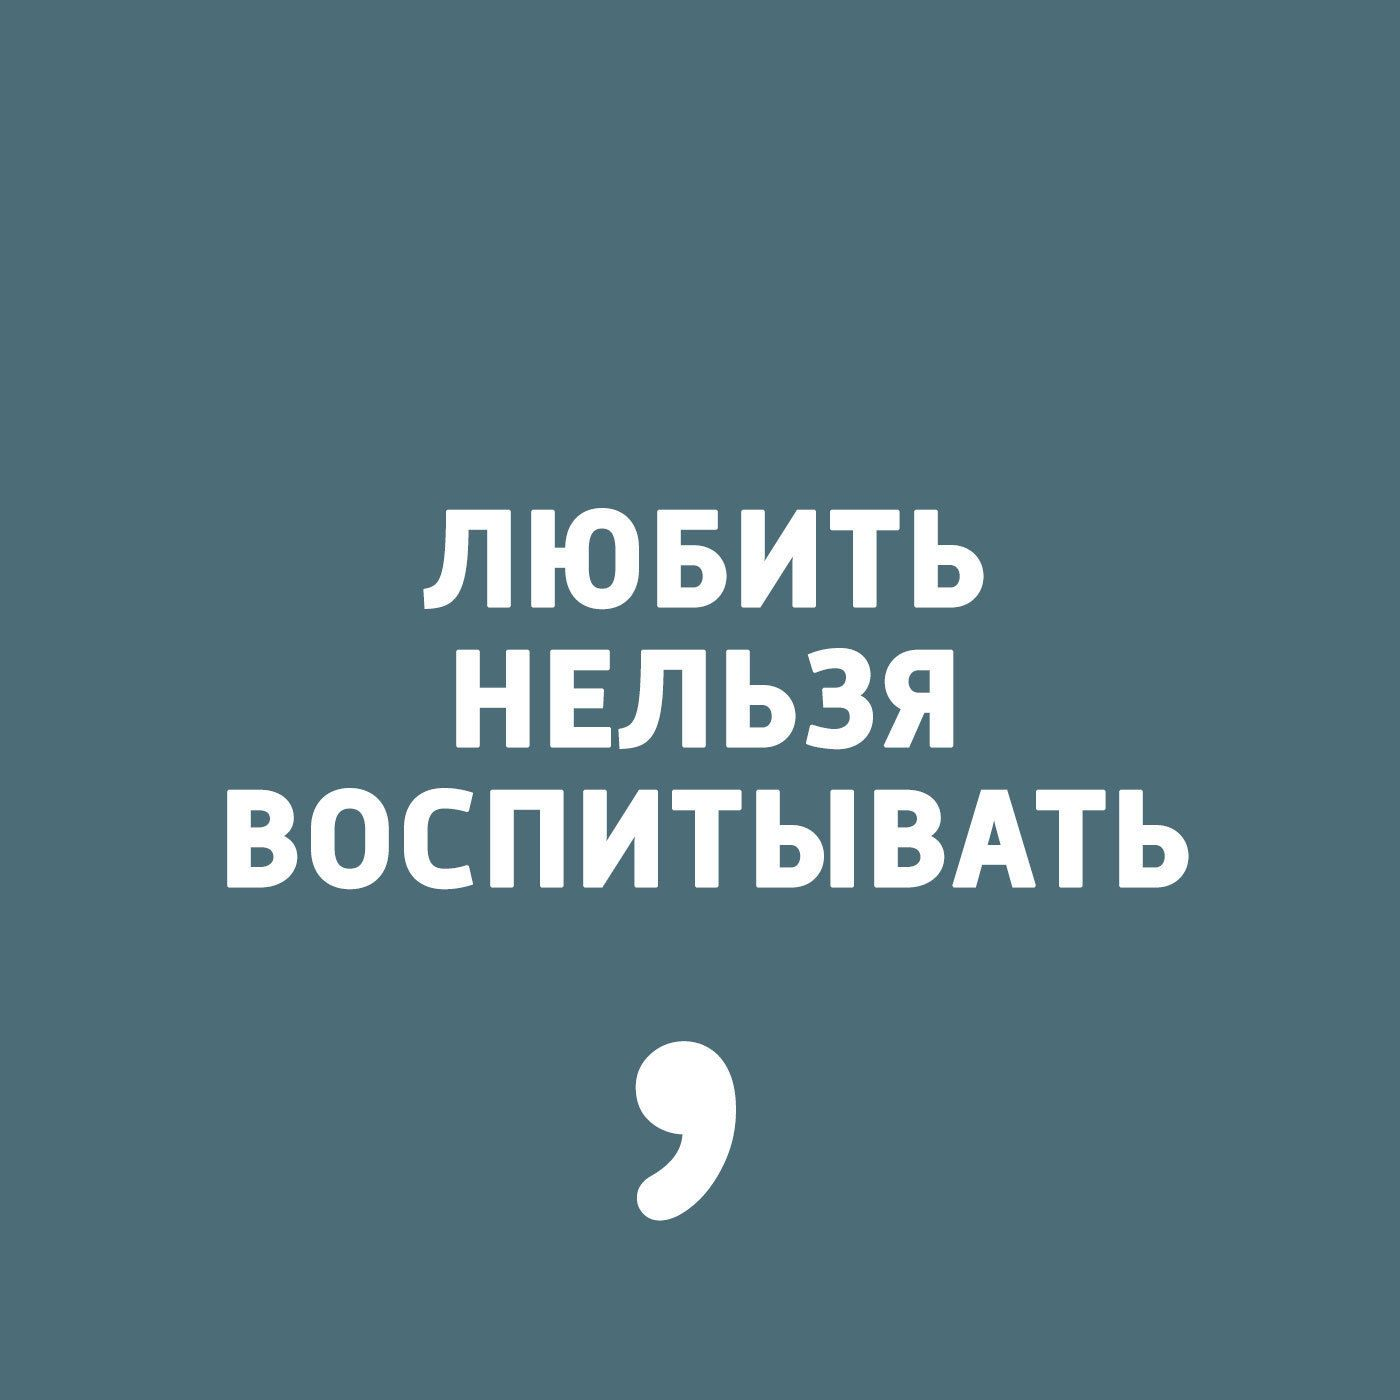 Дима Зицер Выпуск 77 автокресло smart travel first blue 0 1 5 лет 0 13 кг группа 0плюс kres2080